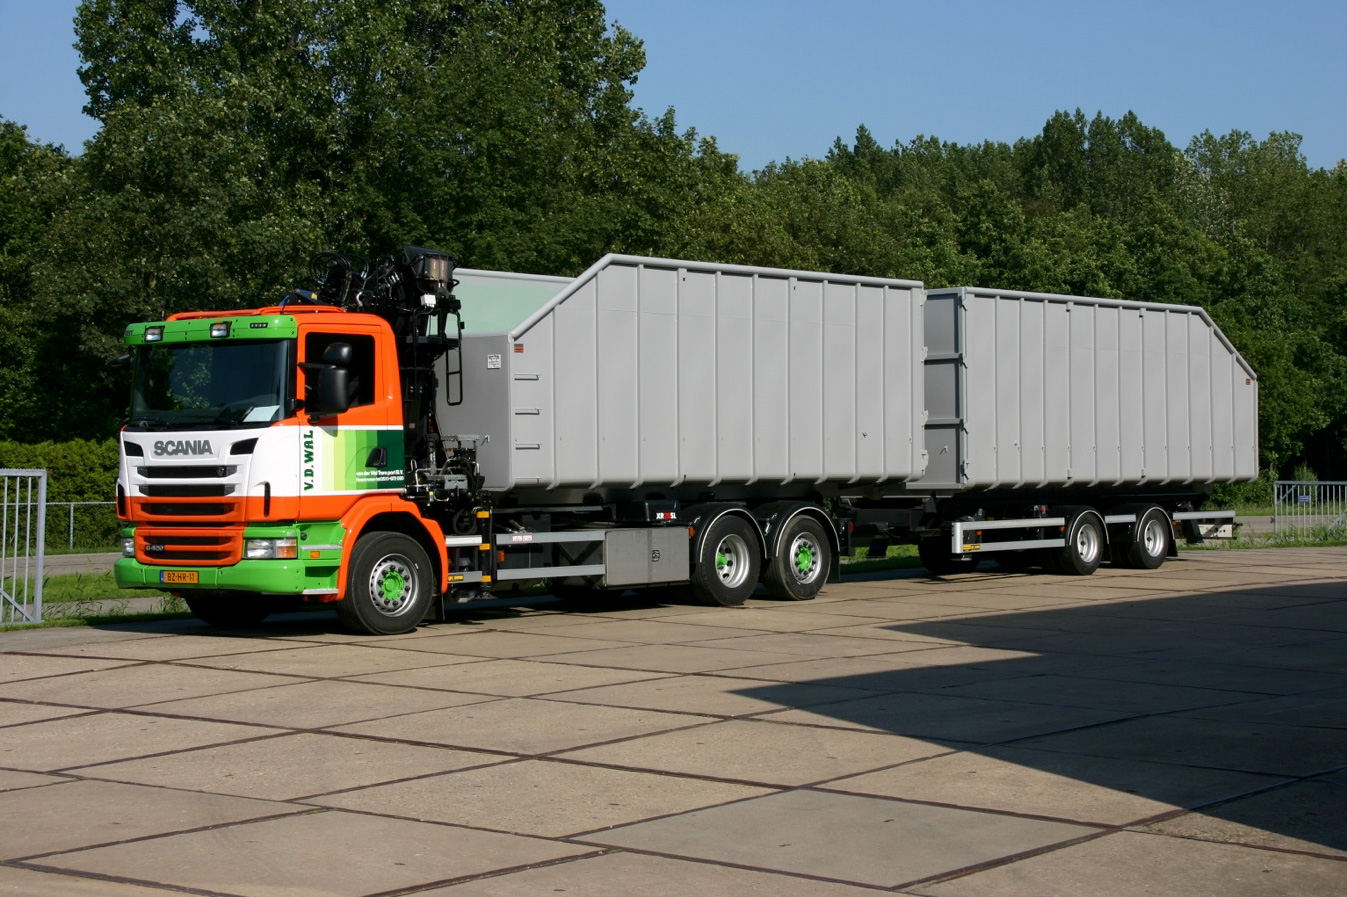 Containersysteem met dubbele oplegger- 500kb.jpg